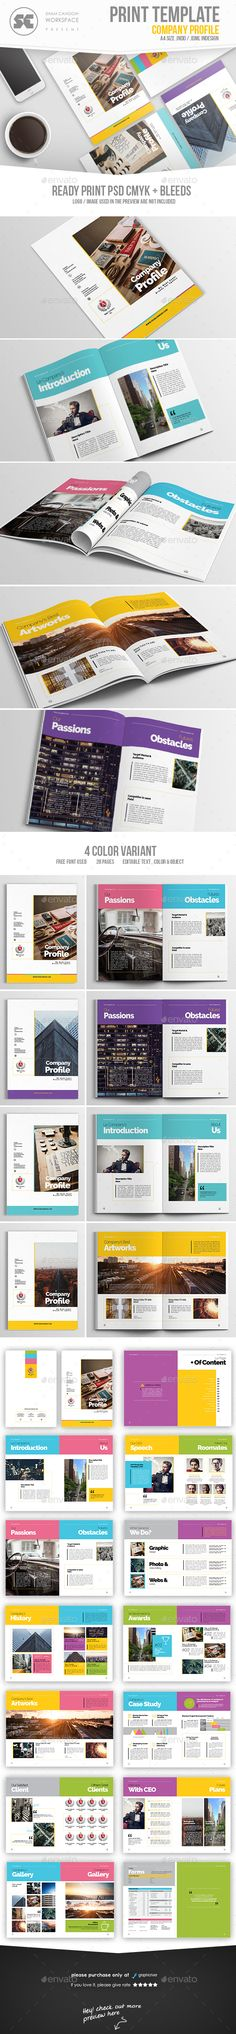 Company Profile Brochure Template InDesign INDD Company Profile - professional business profile template